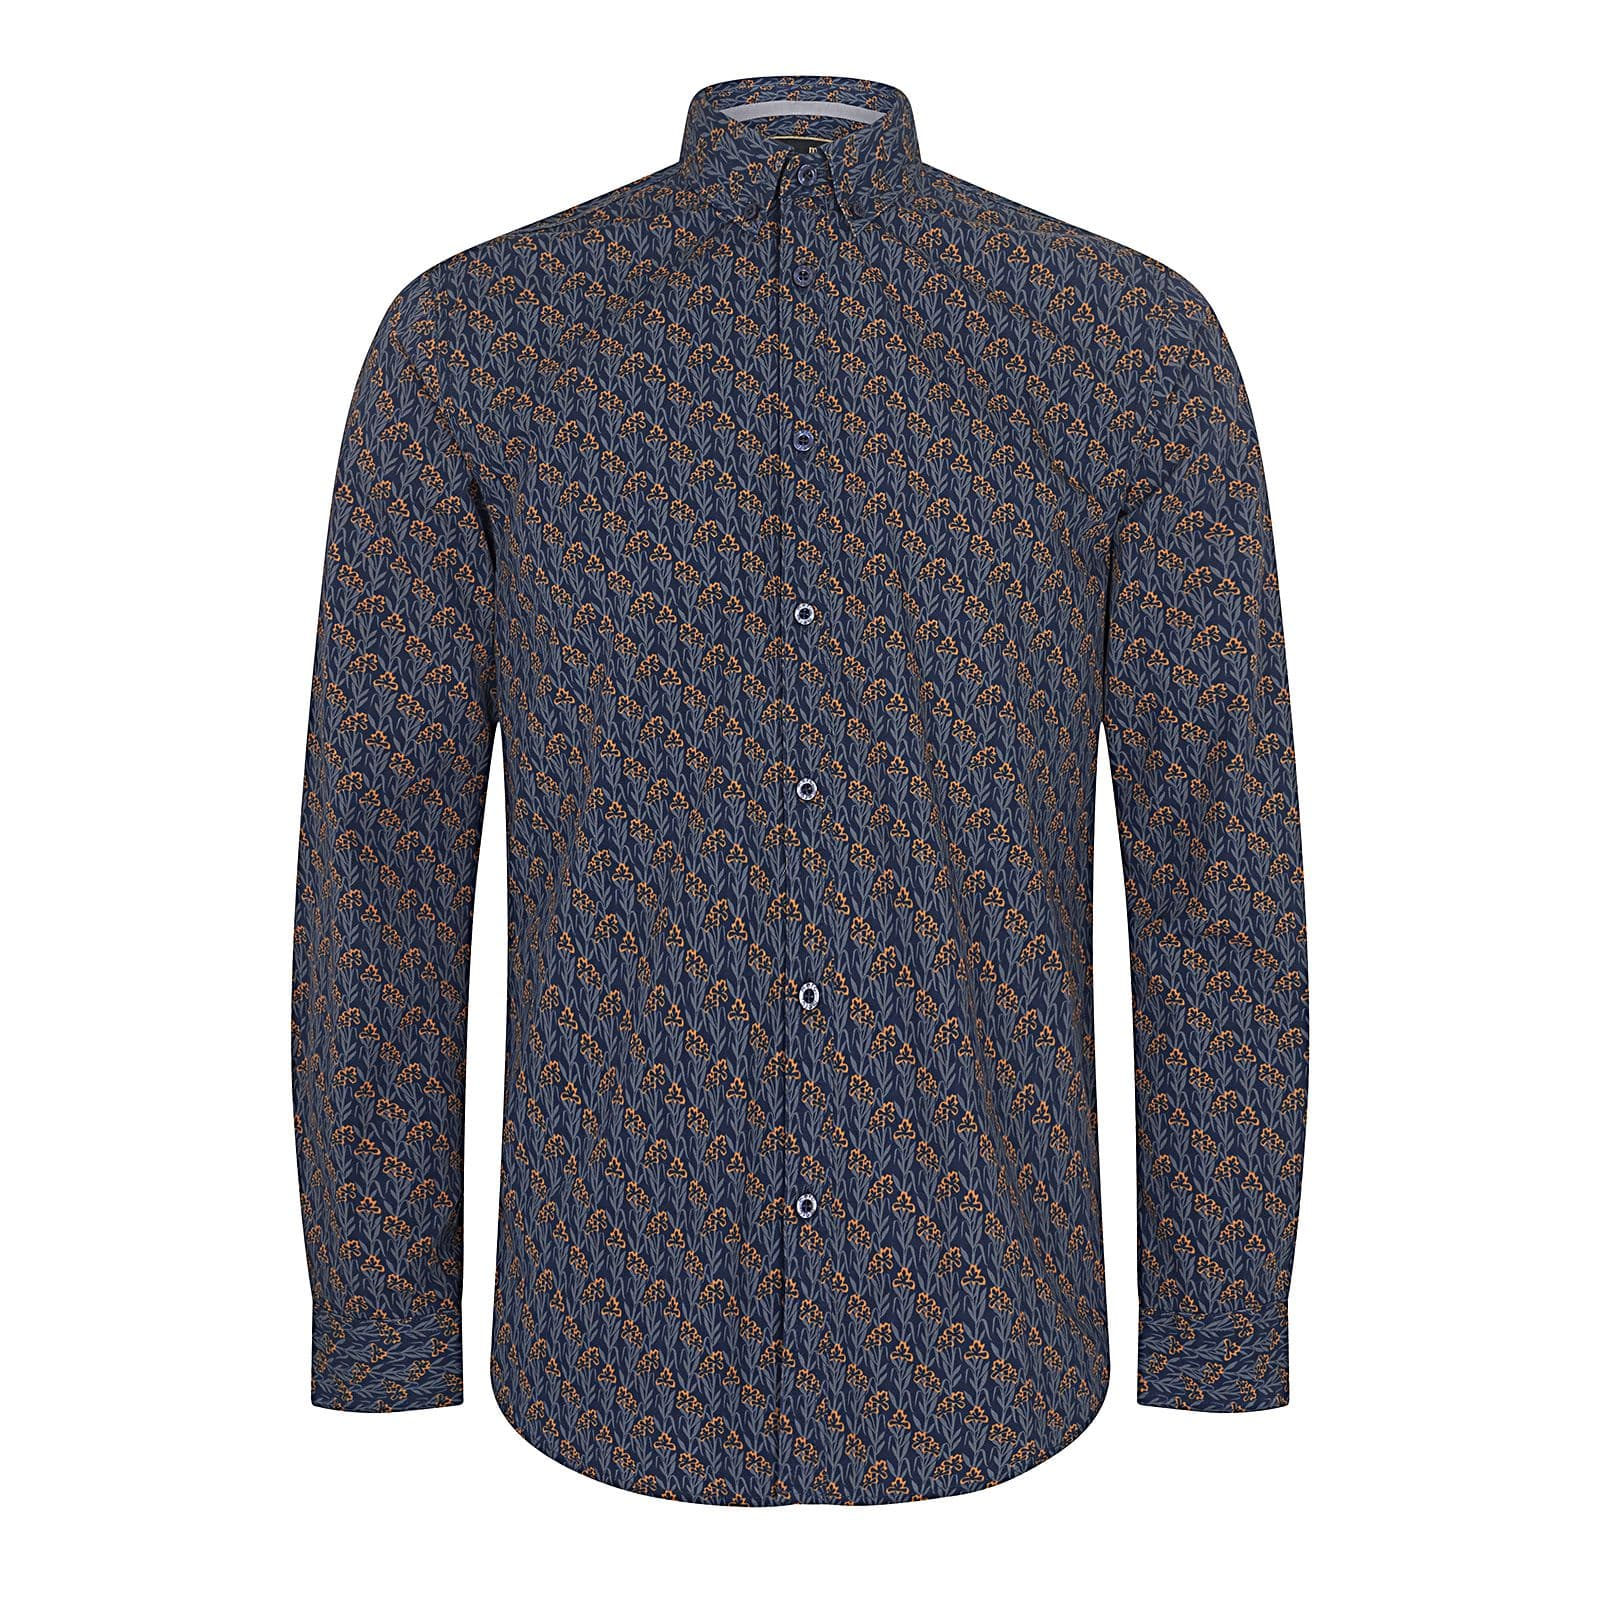 Рубашка ThorneРубашки под заказ<br><br><br>Артикул: 1517206<br>Материал: 100% хлопок<br>Цвет: синий с оранжевым<br>Пол: Мужской